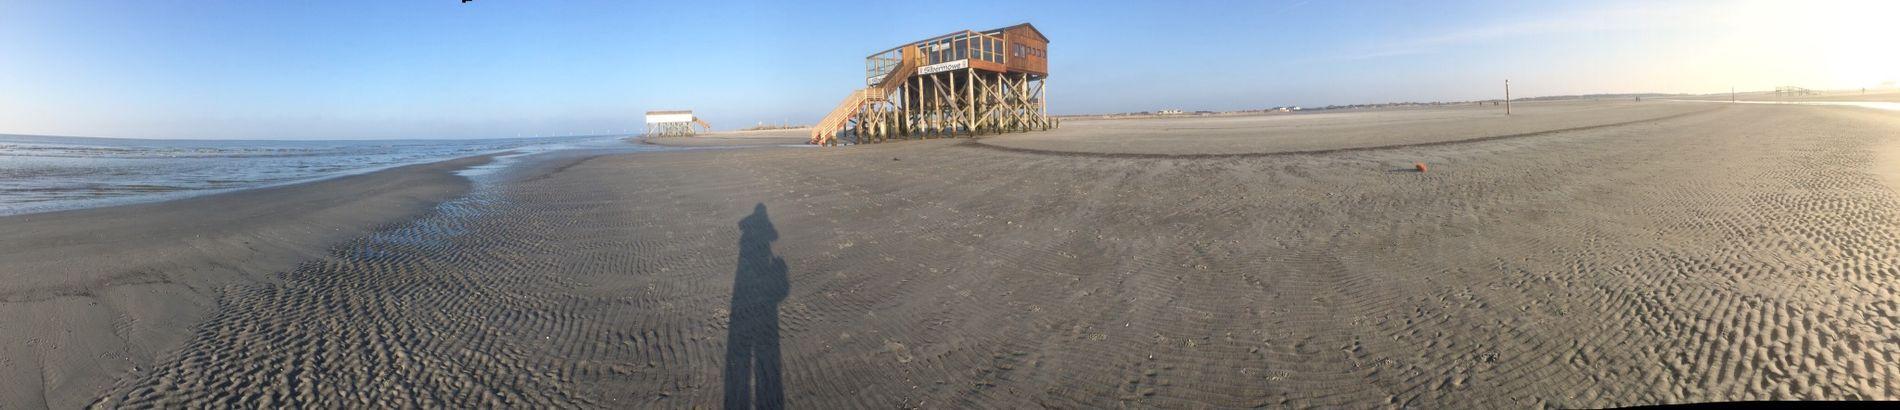 St. Peter Ording Beach Nordsee Northsea Strand Relaxing Having Fun Panorama Panoramic Shadow